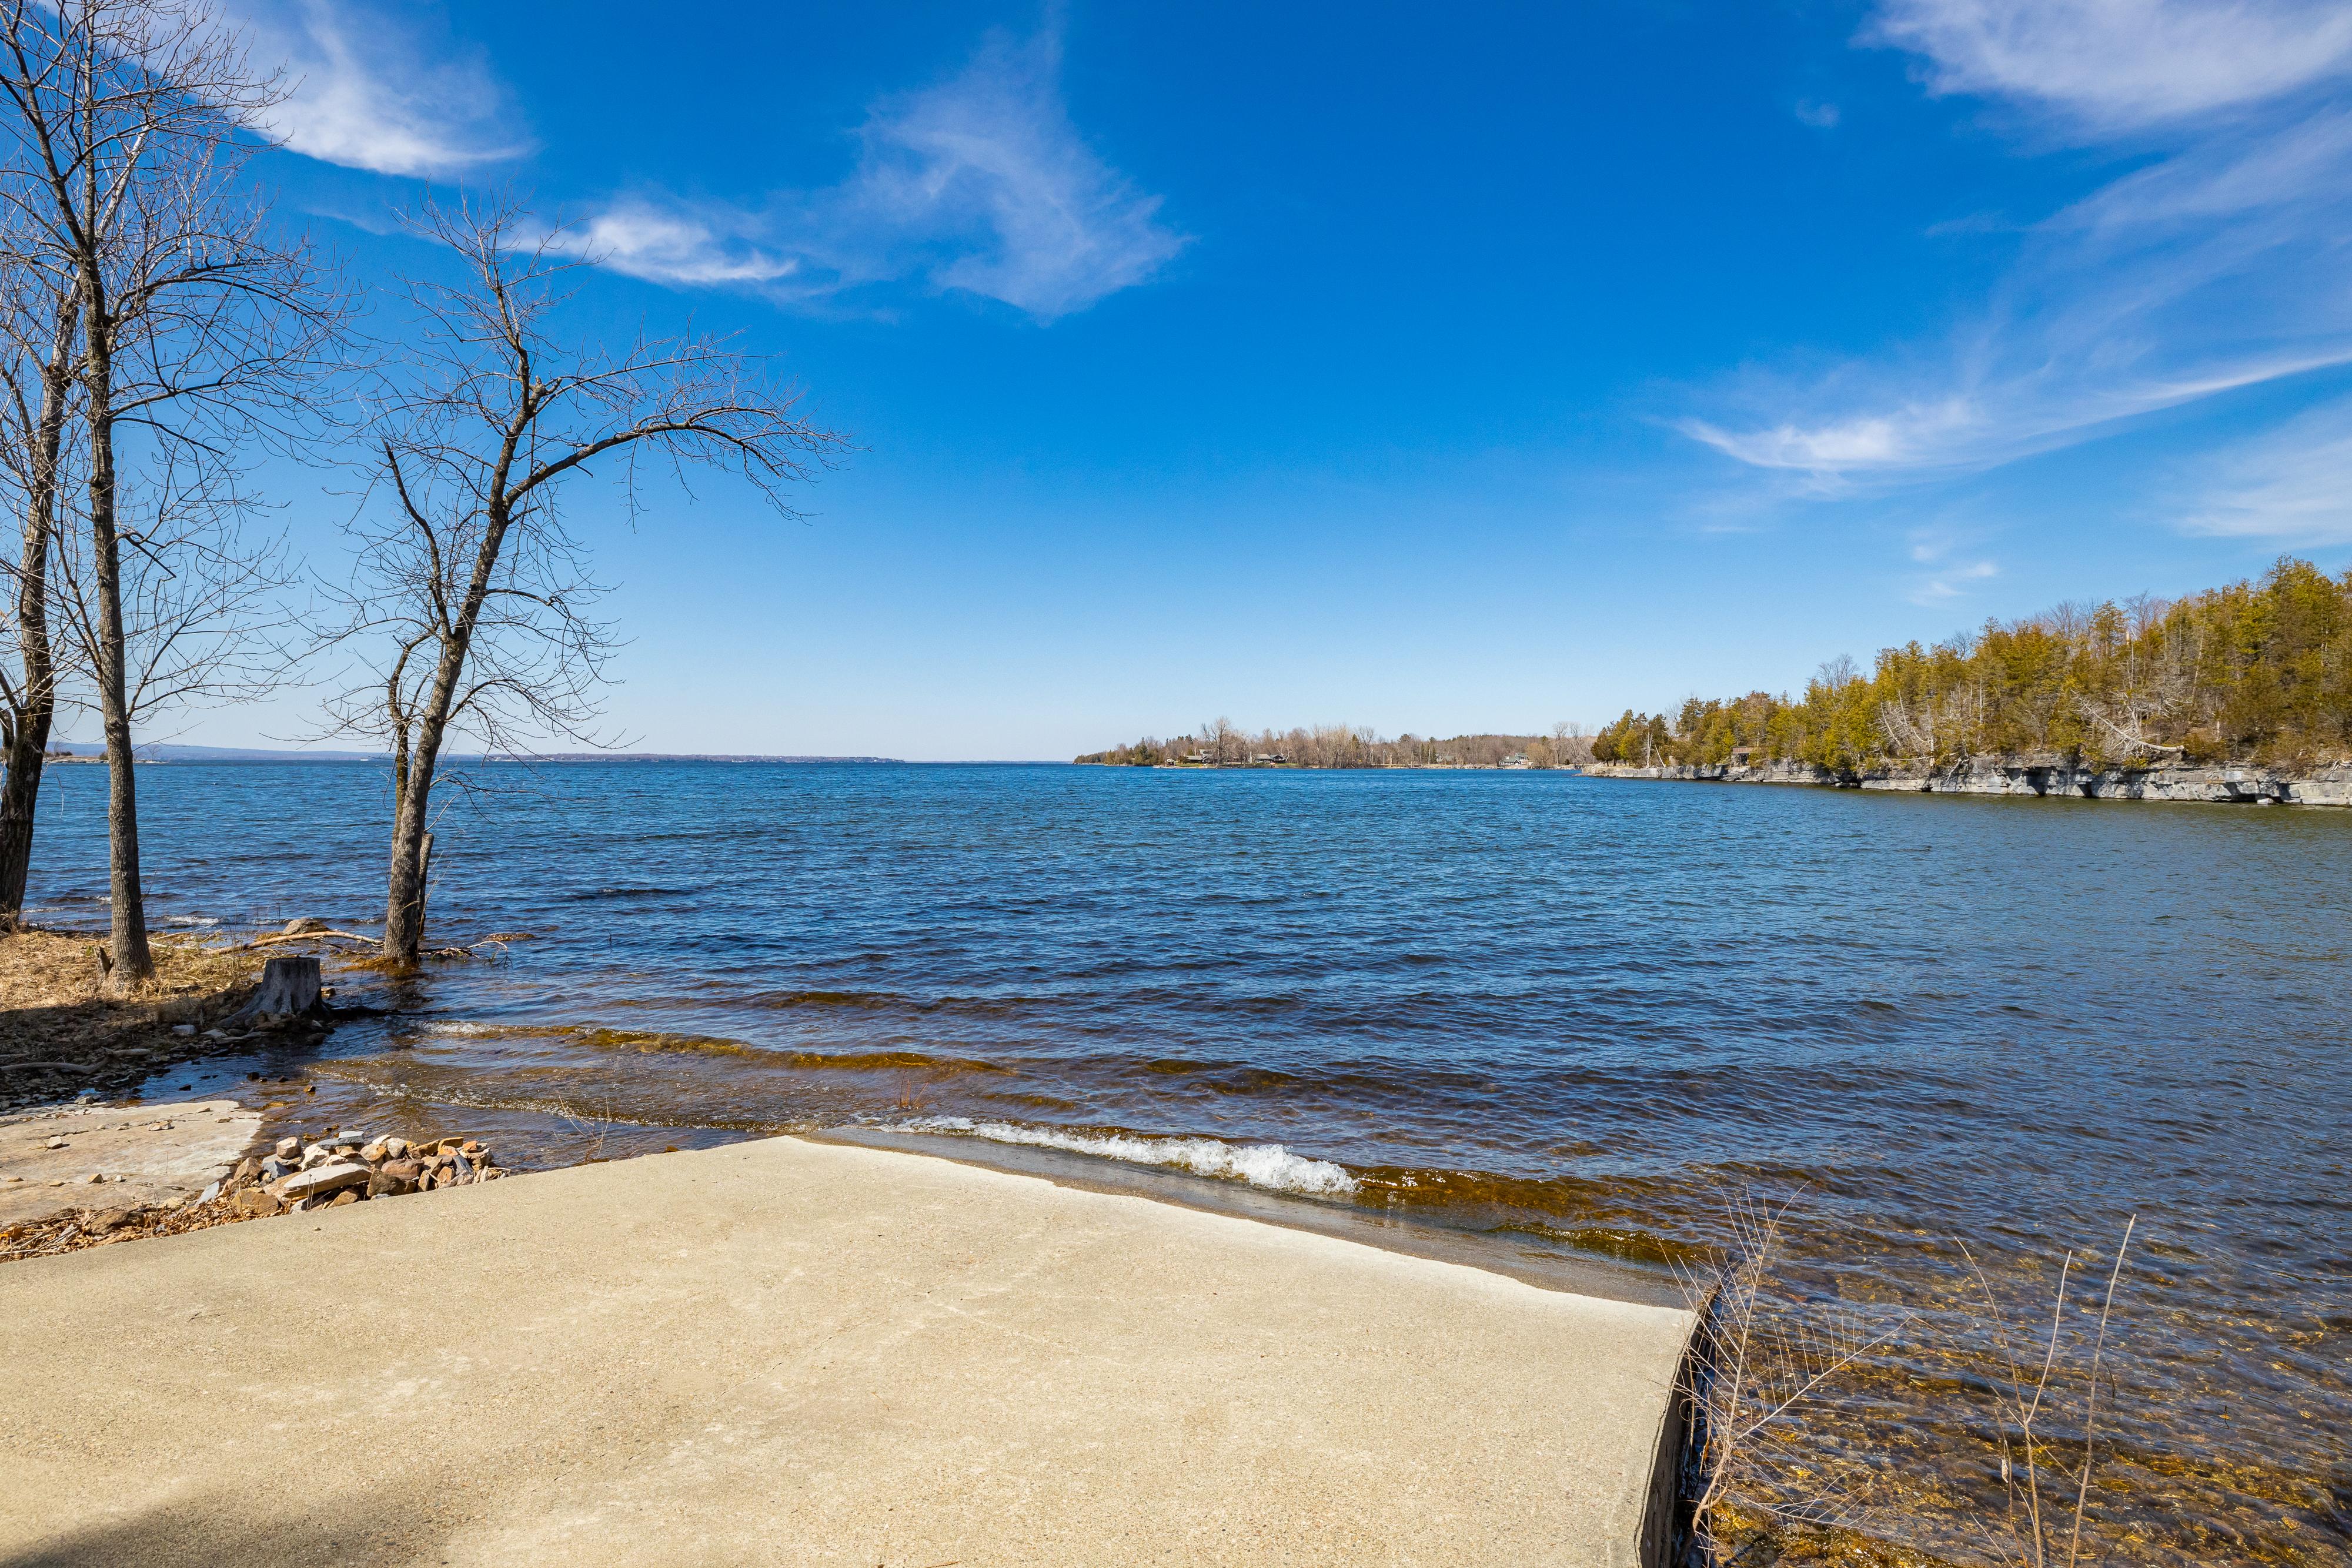 341 West Shore Road - Lake